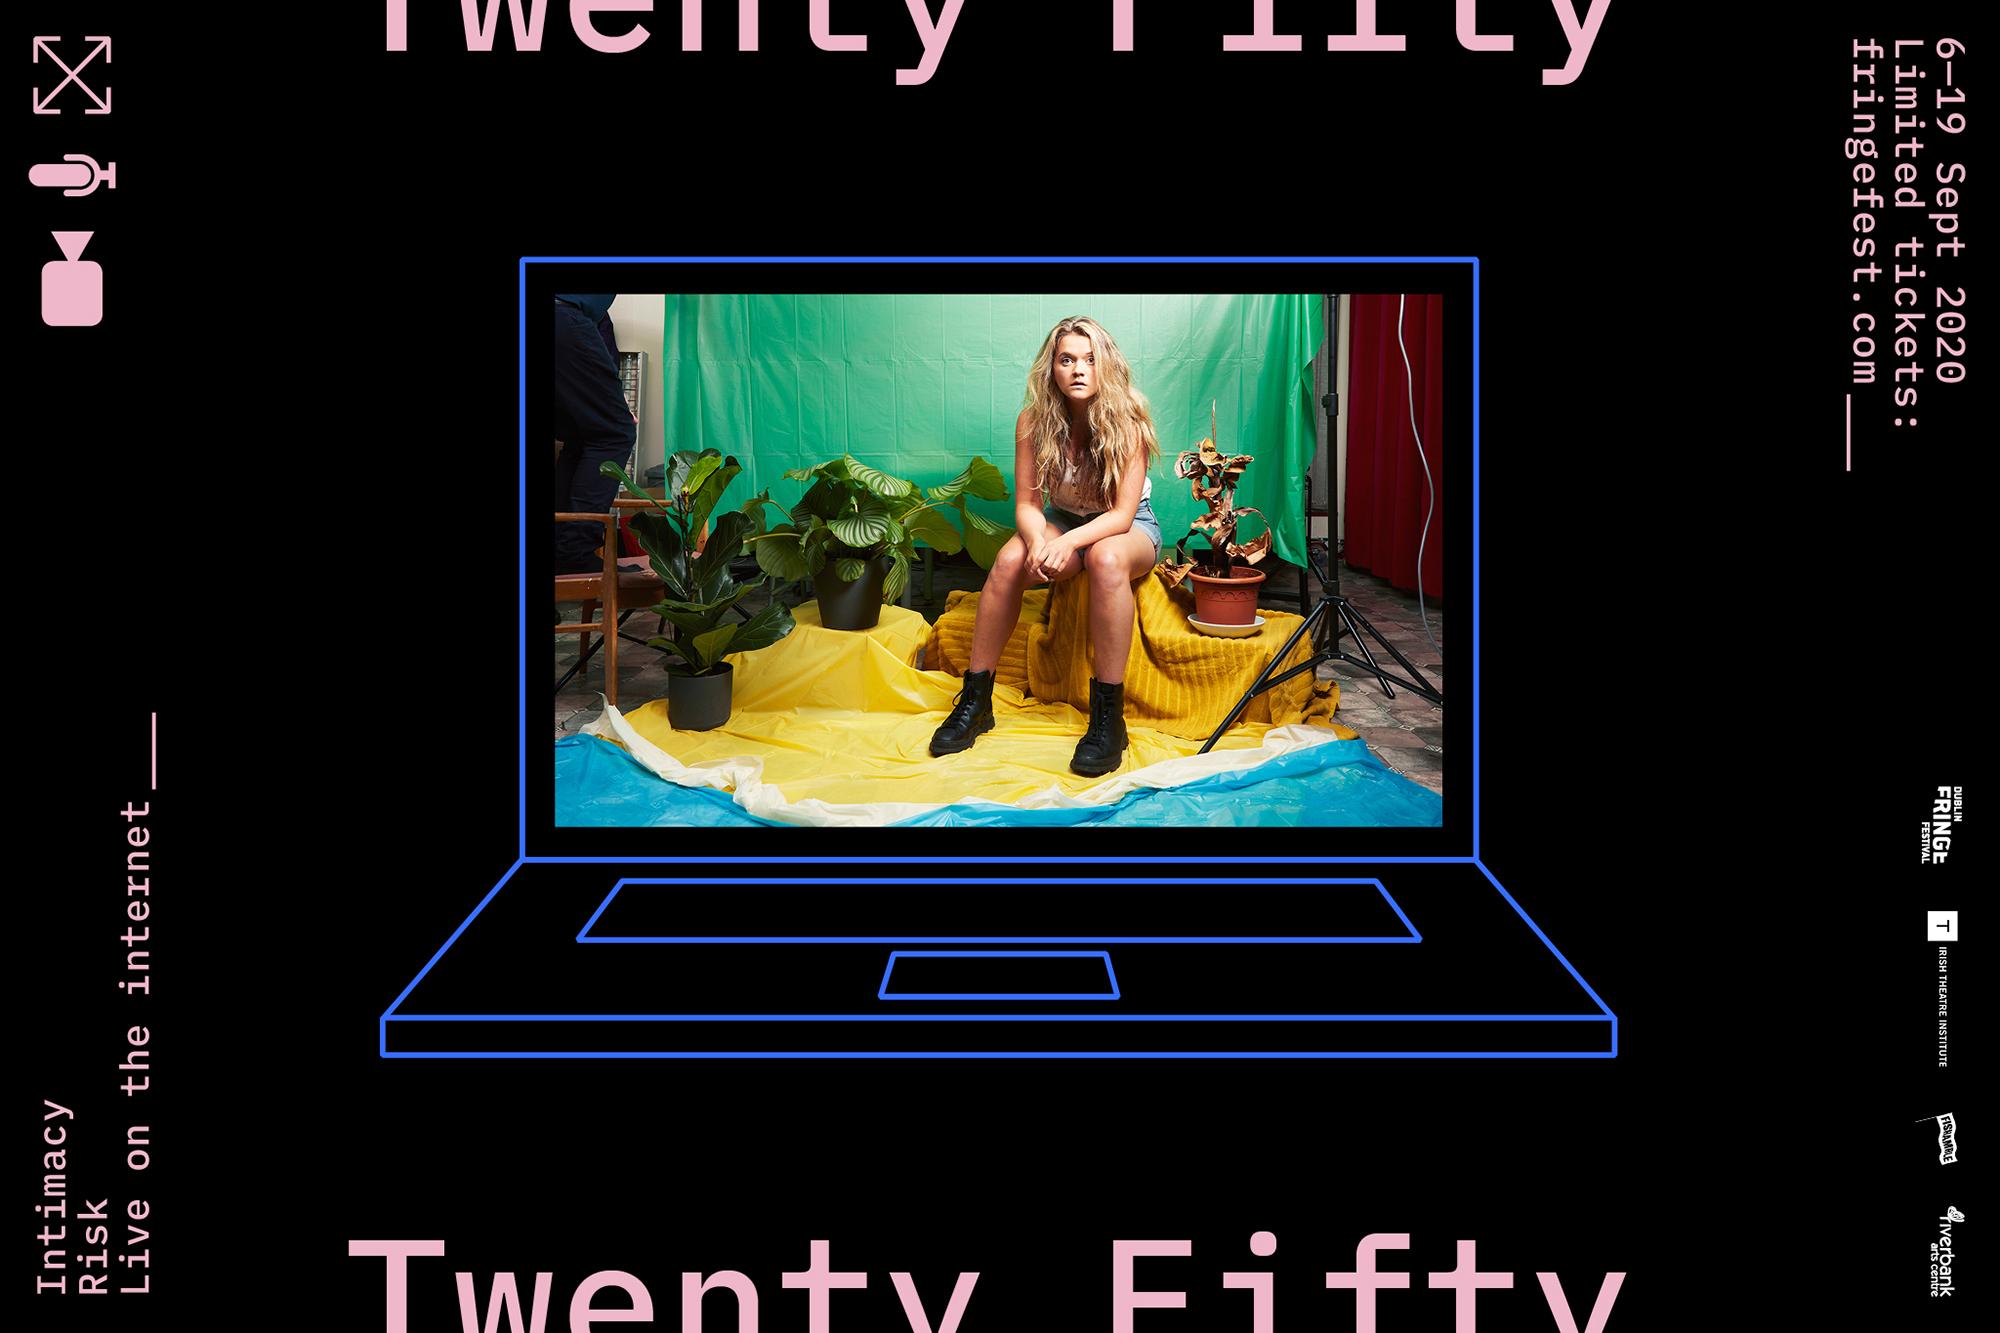 Cover image: Twenty Fifty